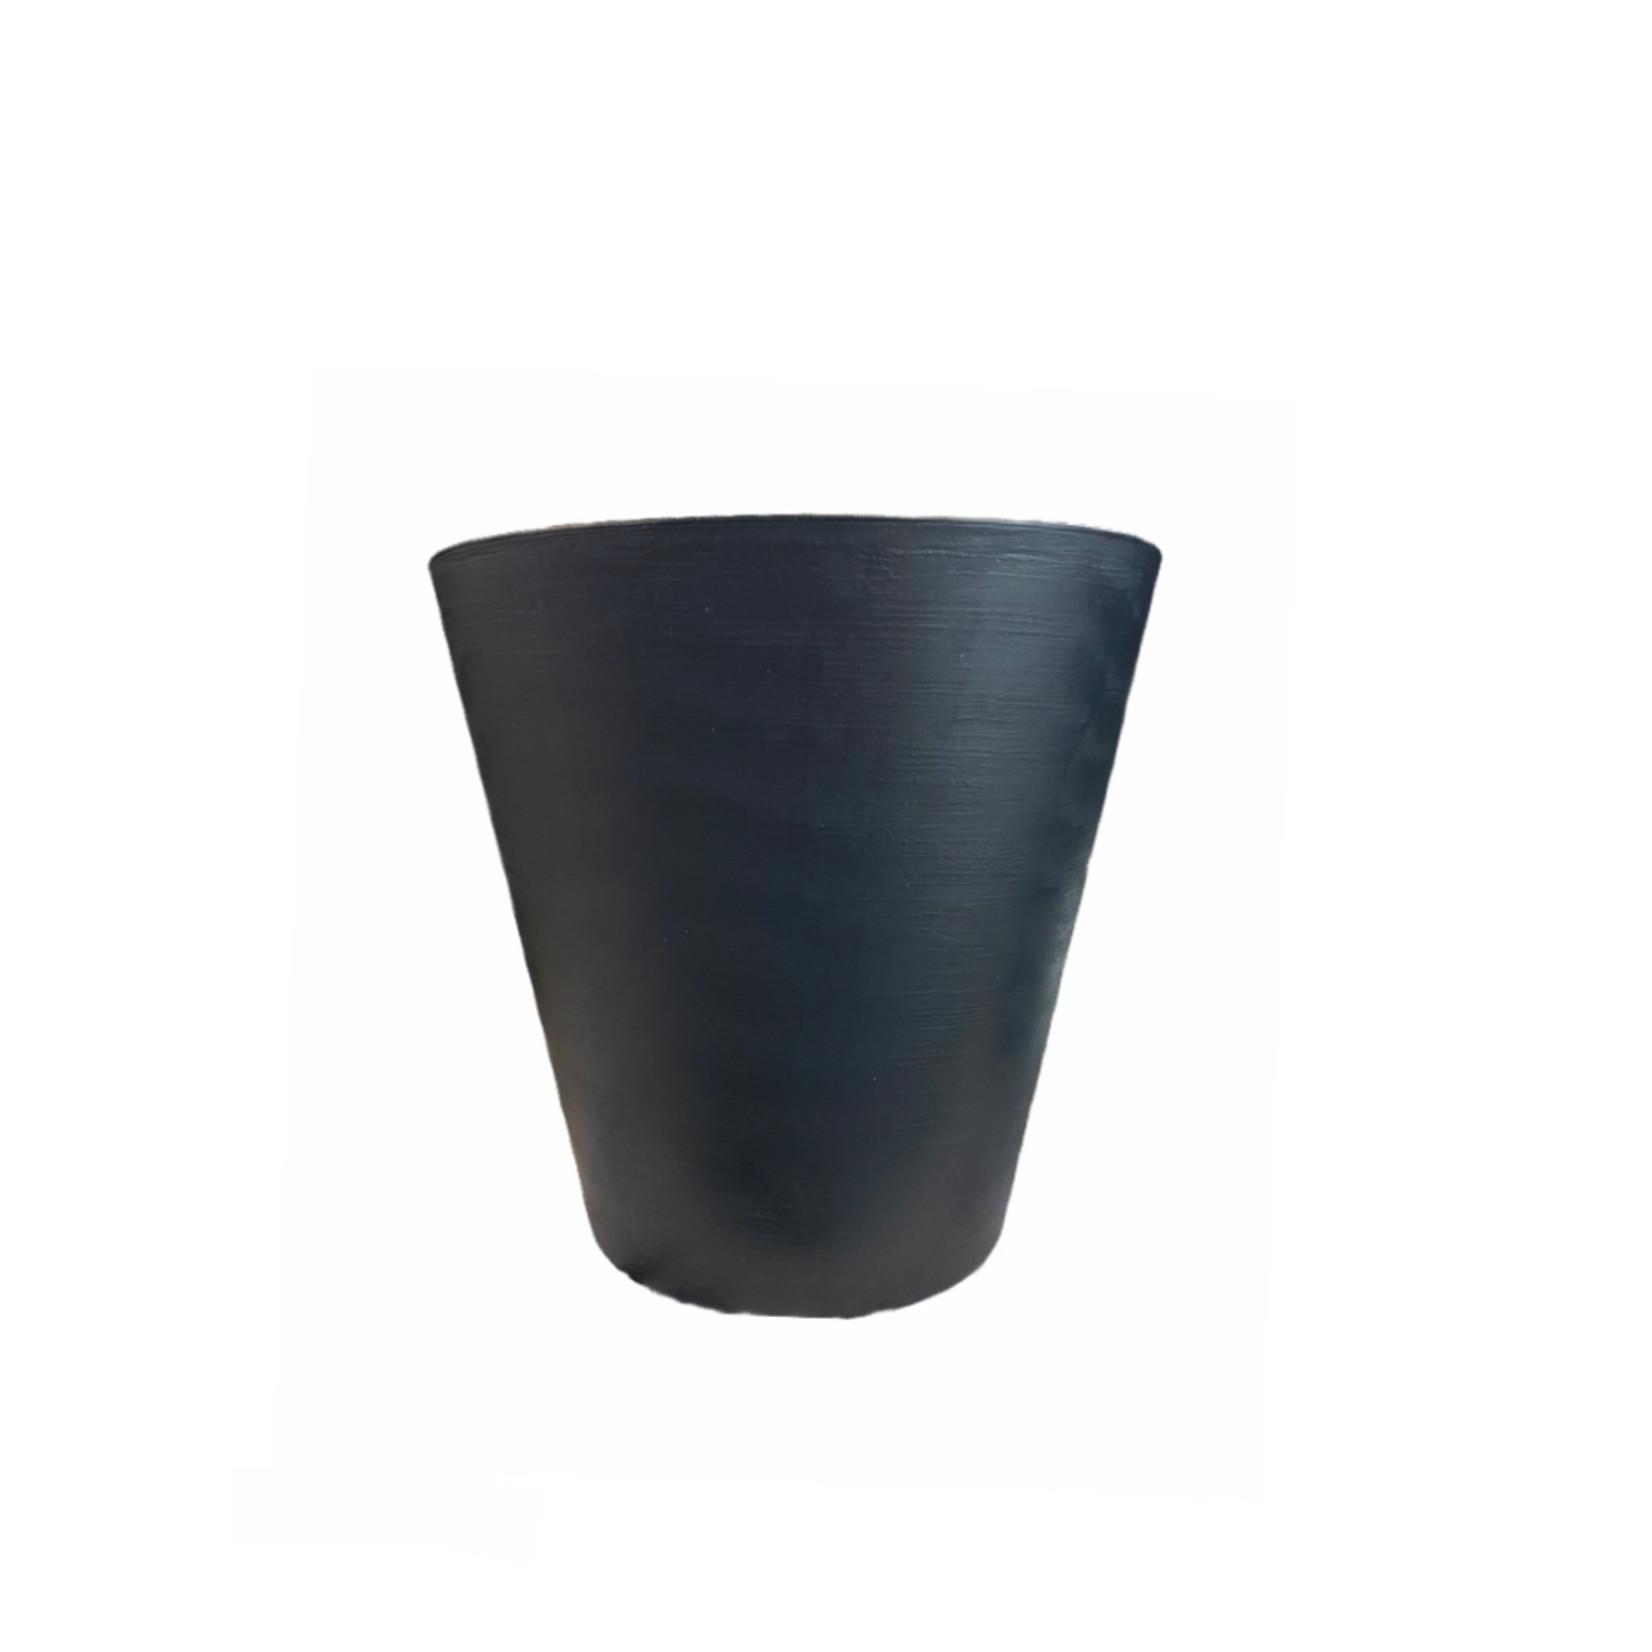 Teraplast Repot Hoop Black 20cm